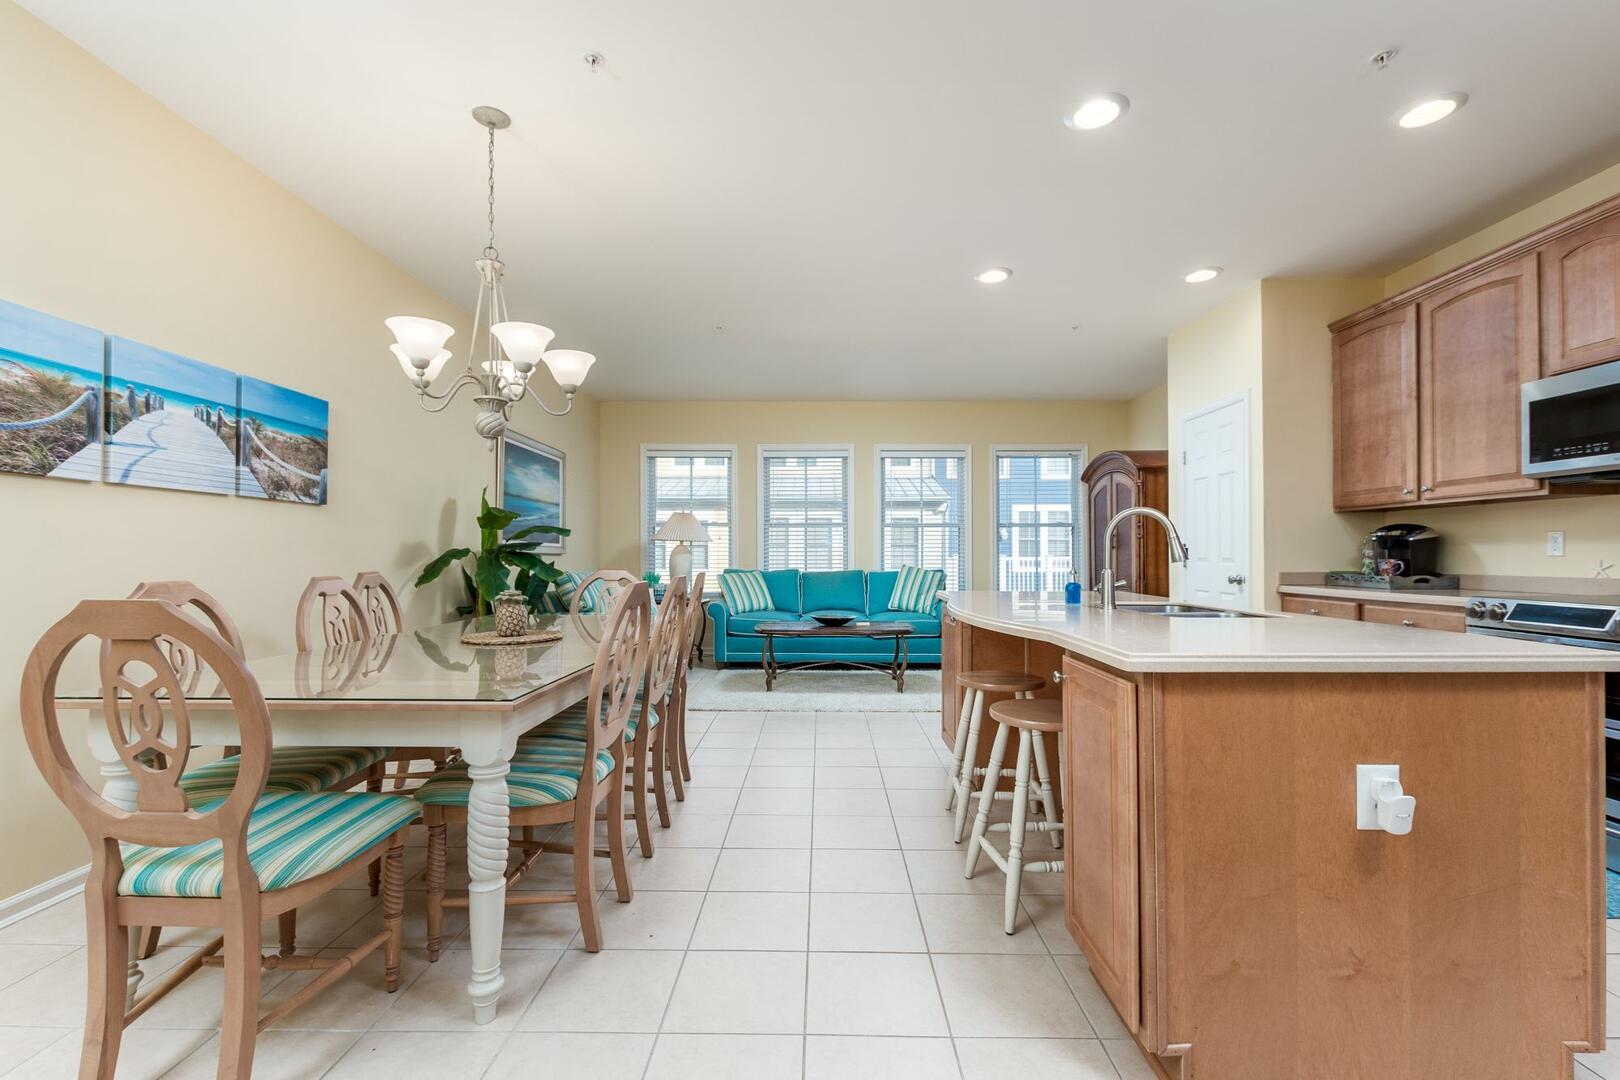 Kitchen, Dining Area, Sitting Area - Sunset Island 34 Island Edge Dr.